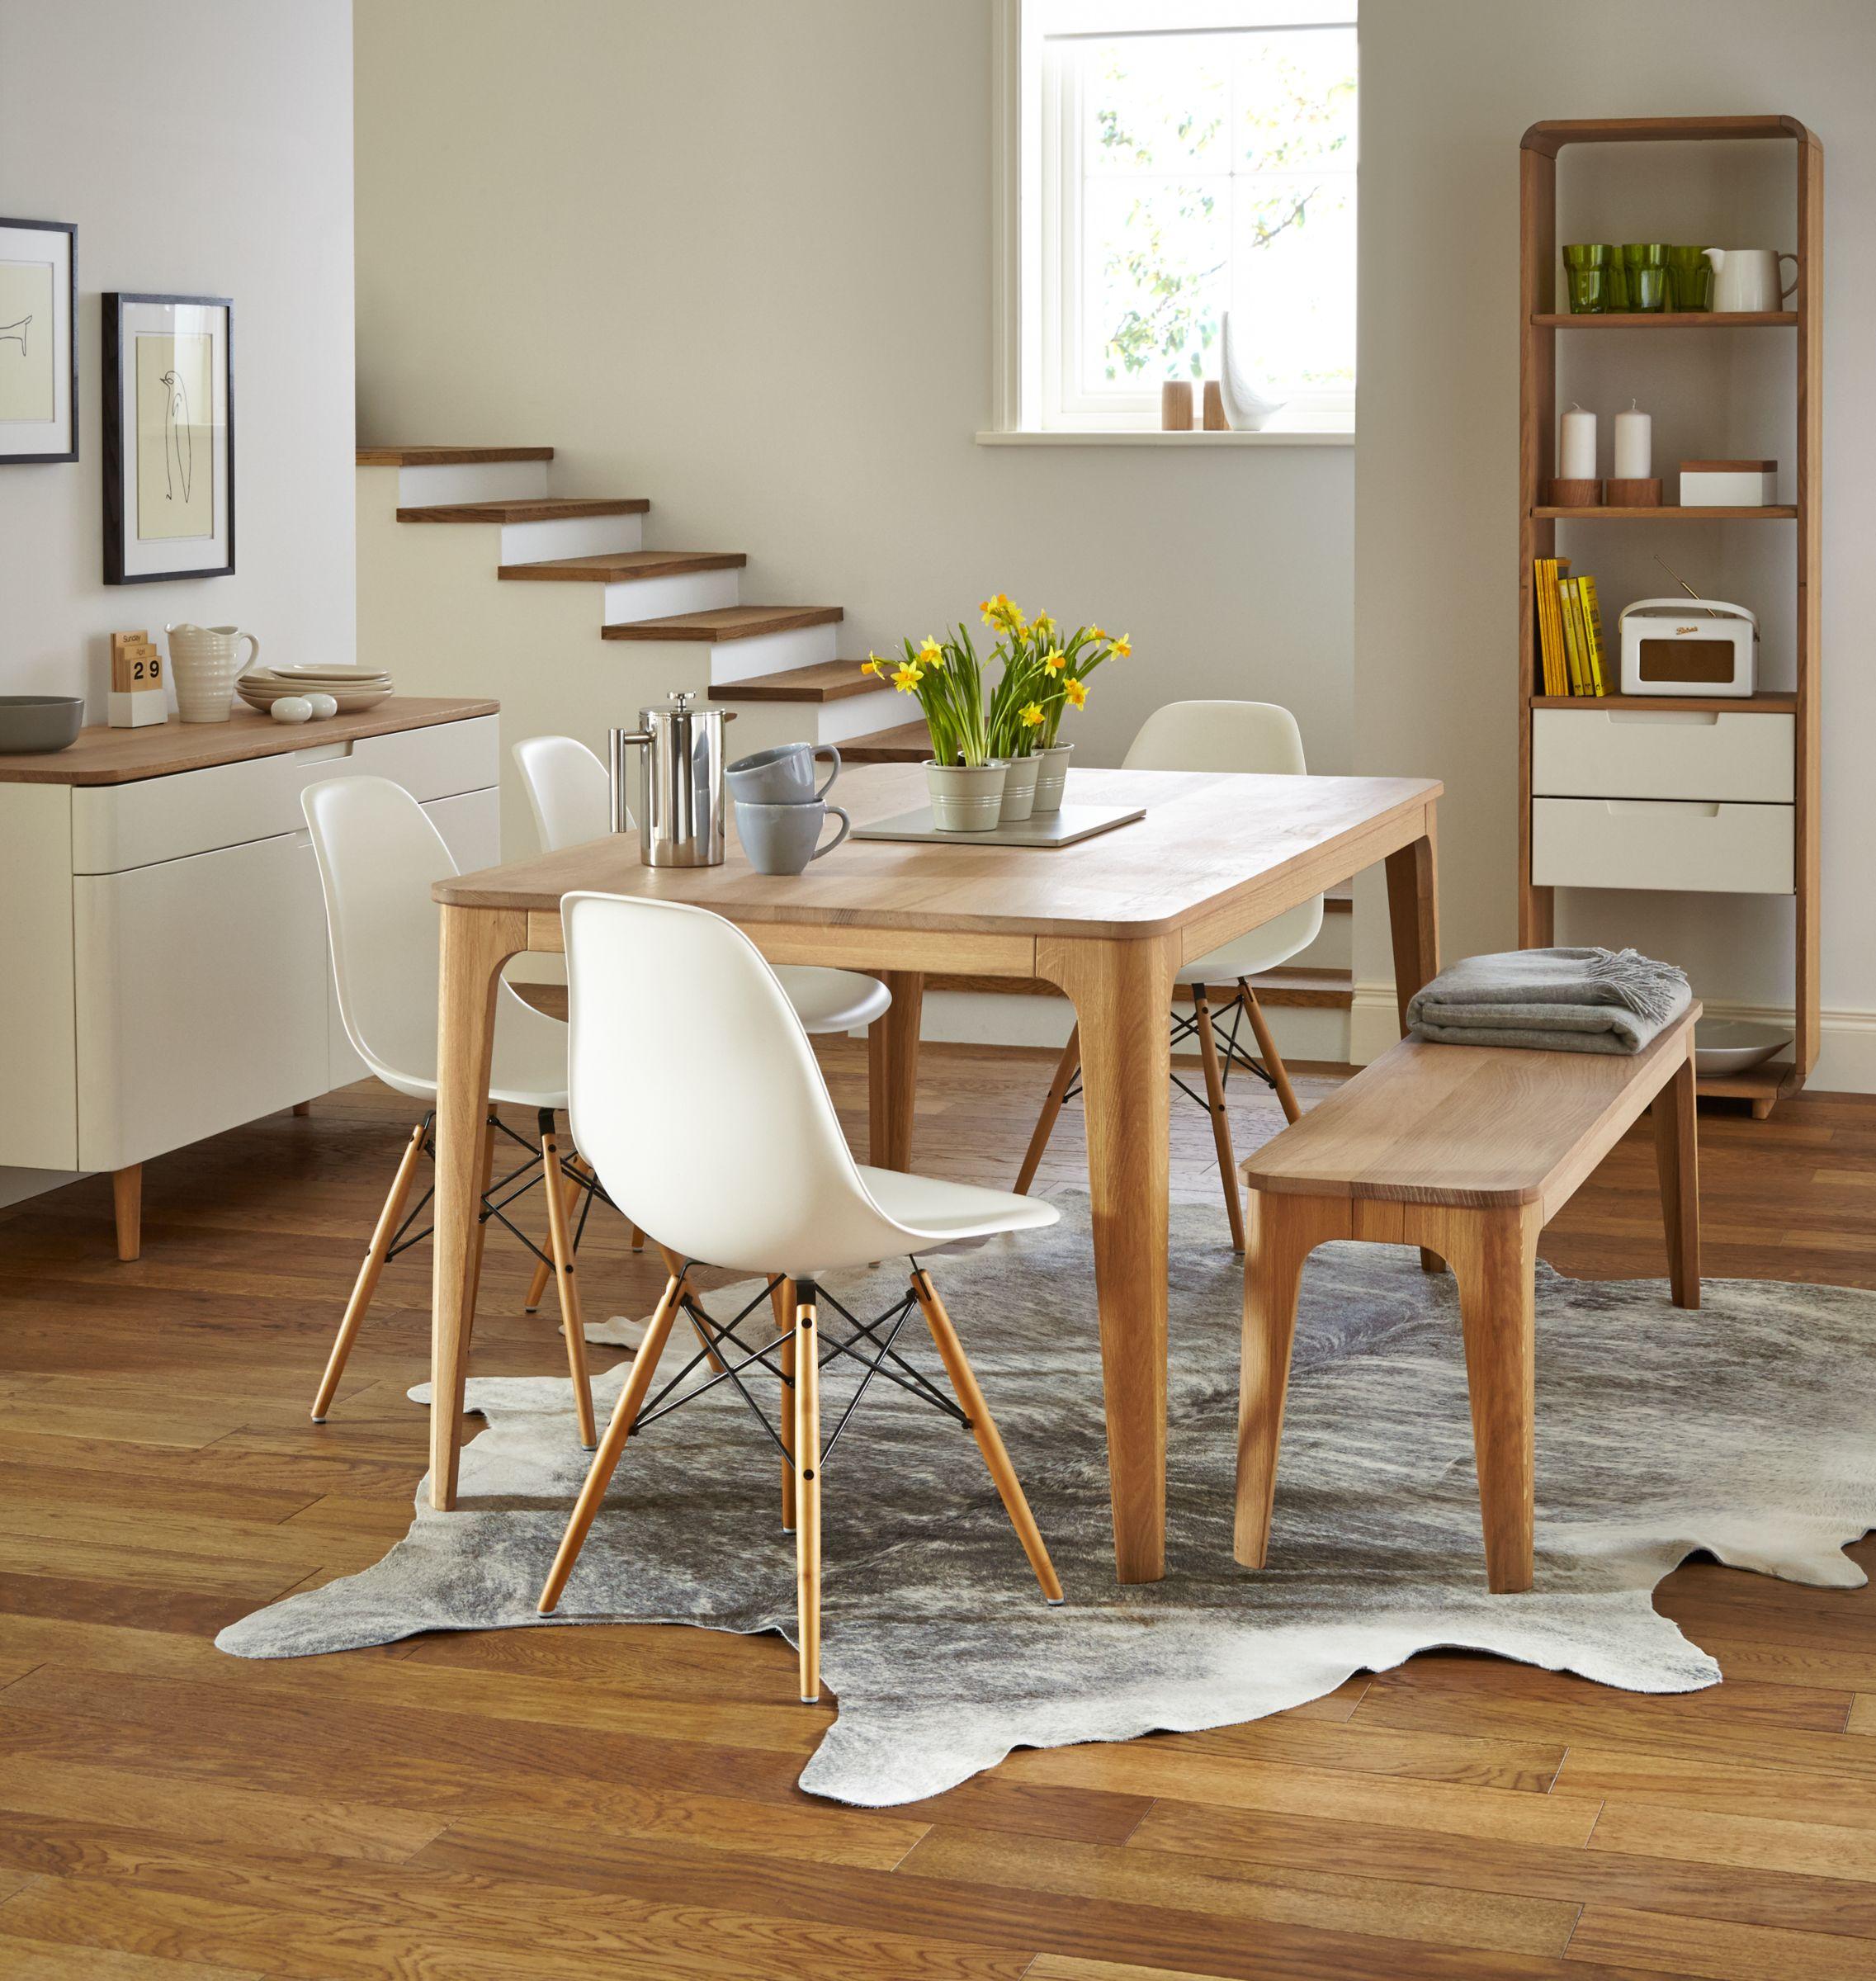 Sideboards gt Livingroom Furniture : LDIN2013MIRAalt1 from livingroomfurniture.1ofsc7a.xip.io size 1516 x 1600 jpeg 478kB